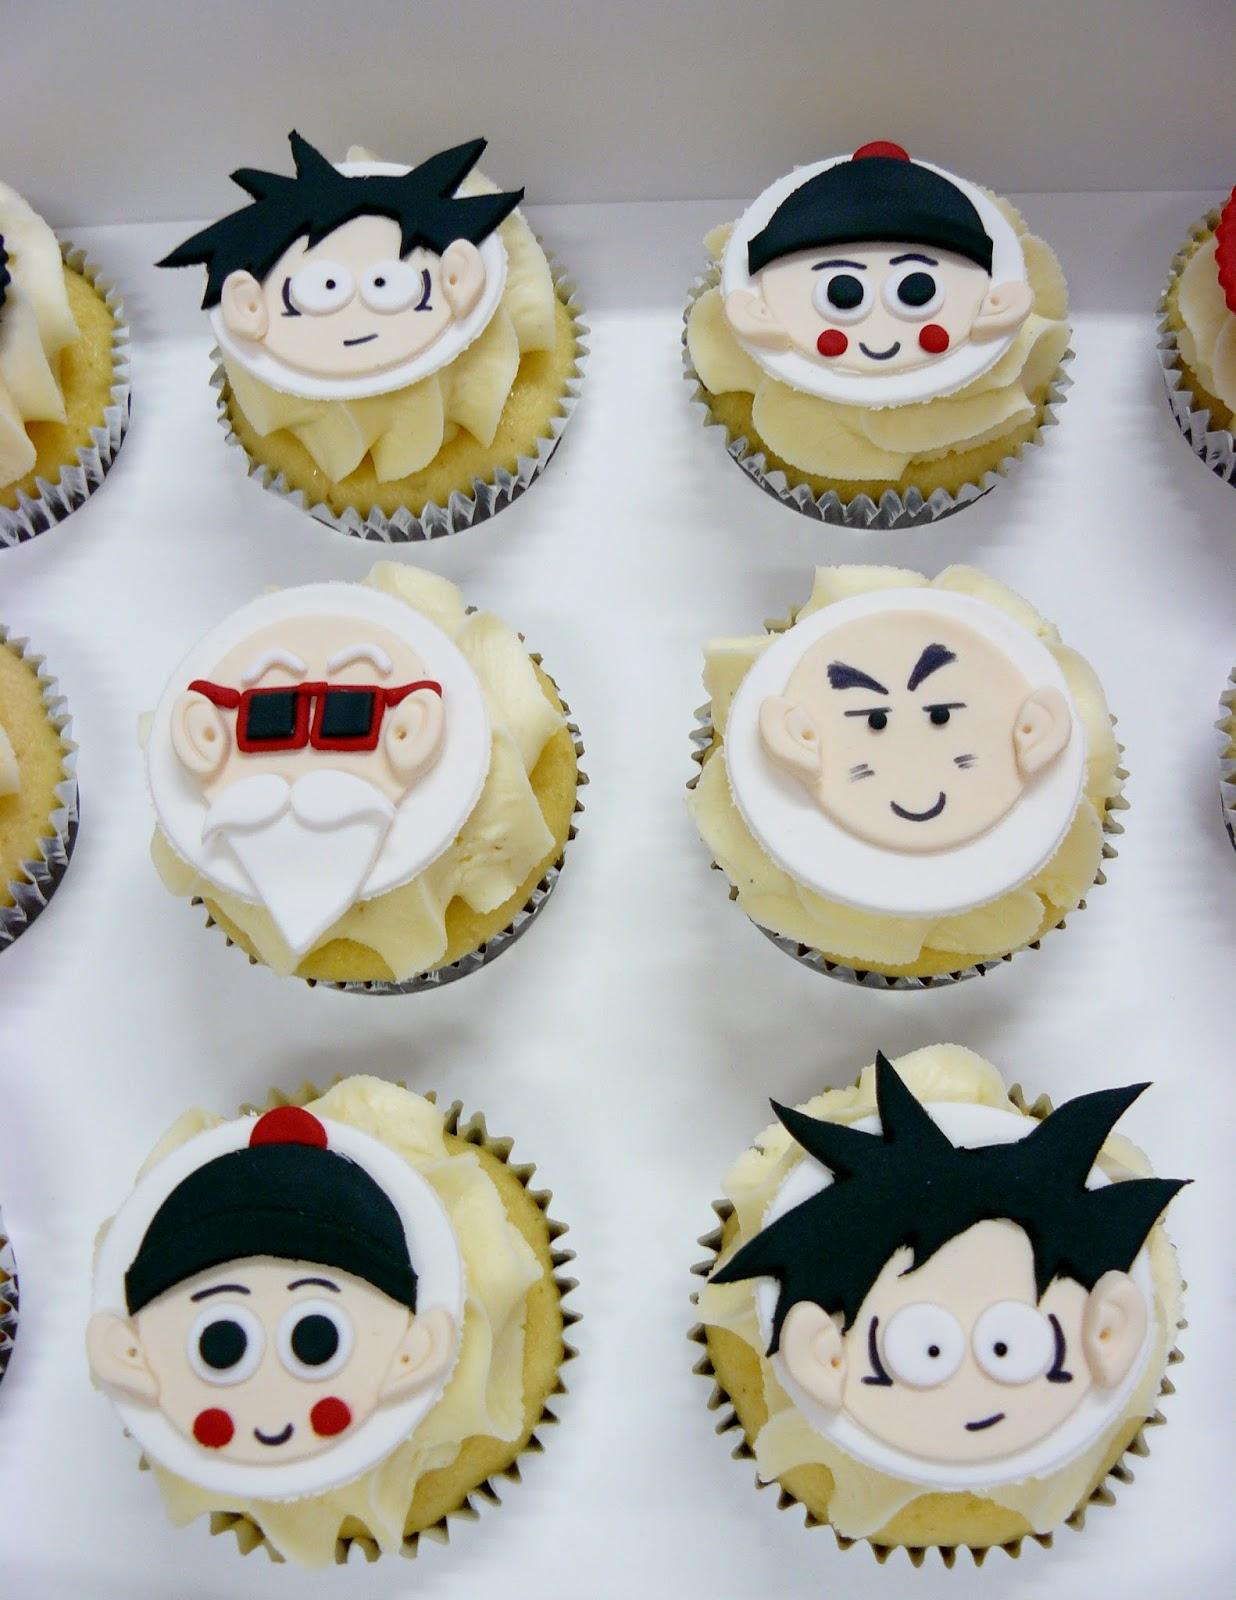 The Cup Cake Taste Brisbane Cupcakes Dragon Ball Z cupcakes